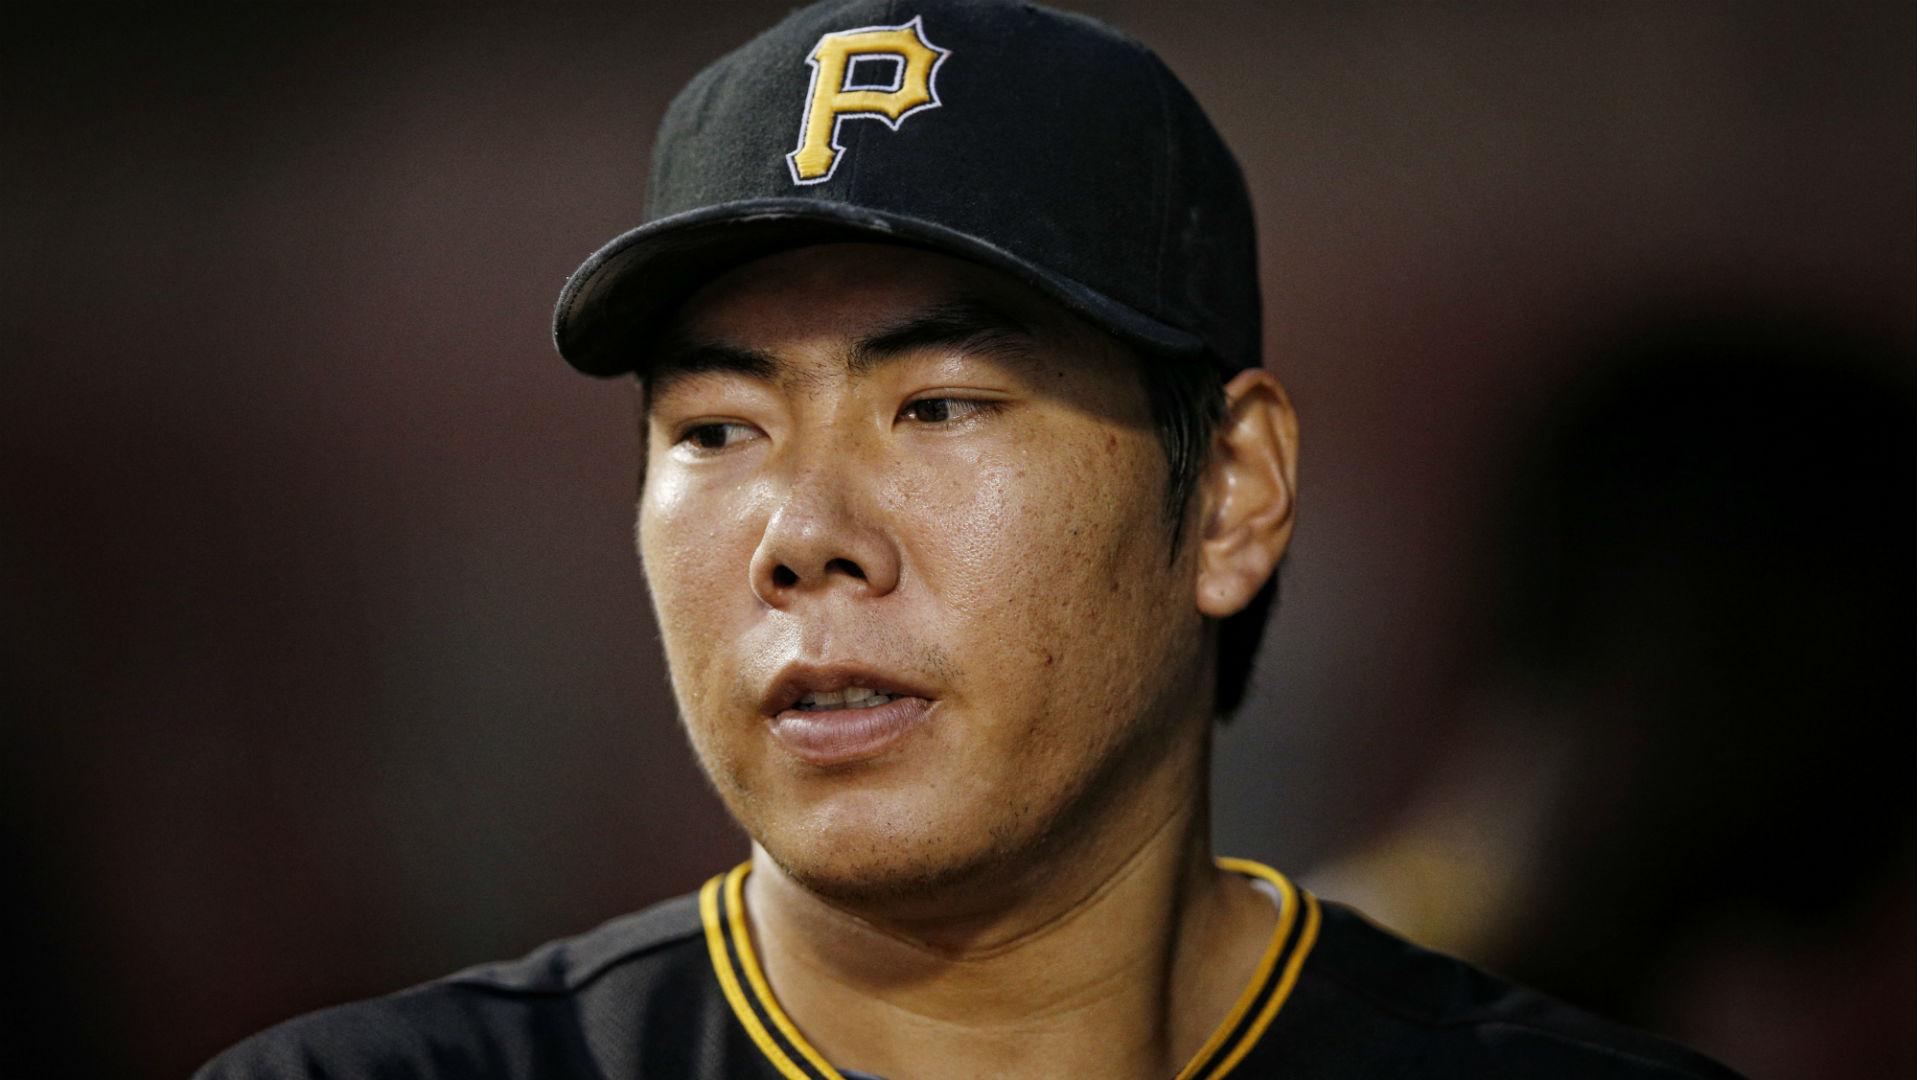 Jung Ho Kang injury update: Pirates infielder to miss 4-6 weeks after wrist surgery